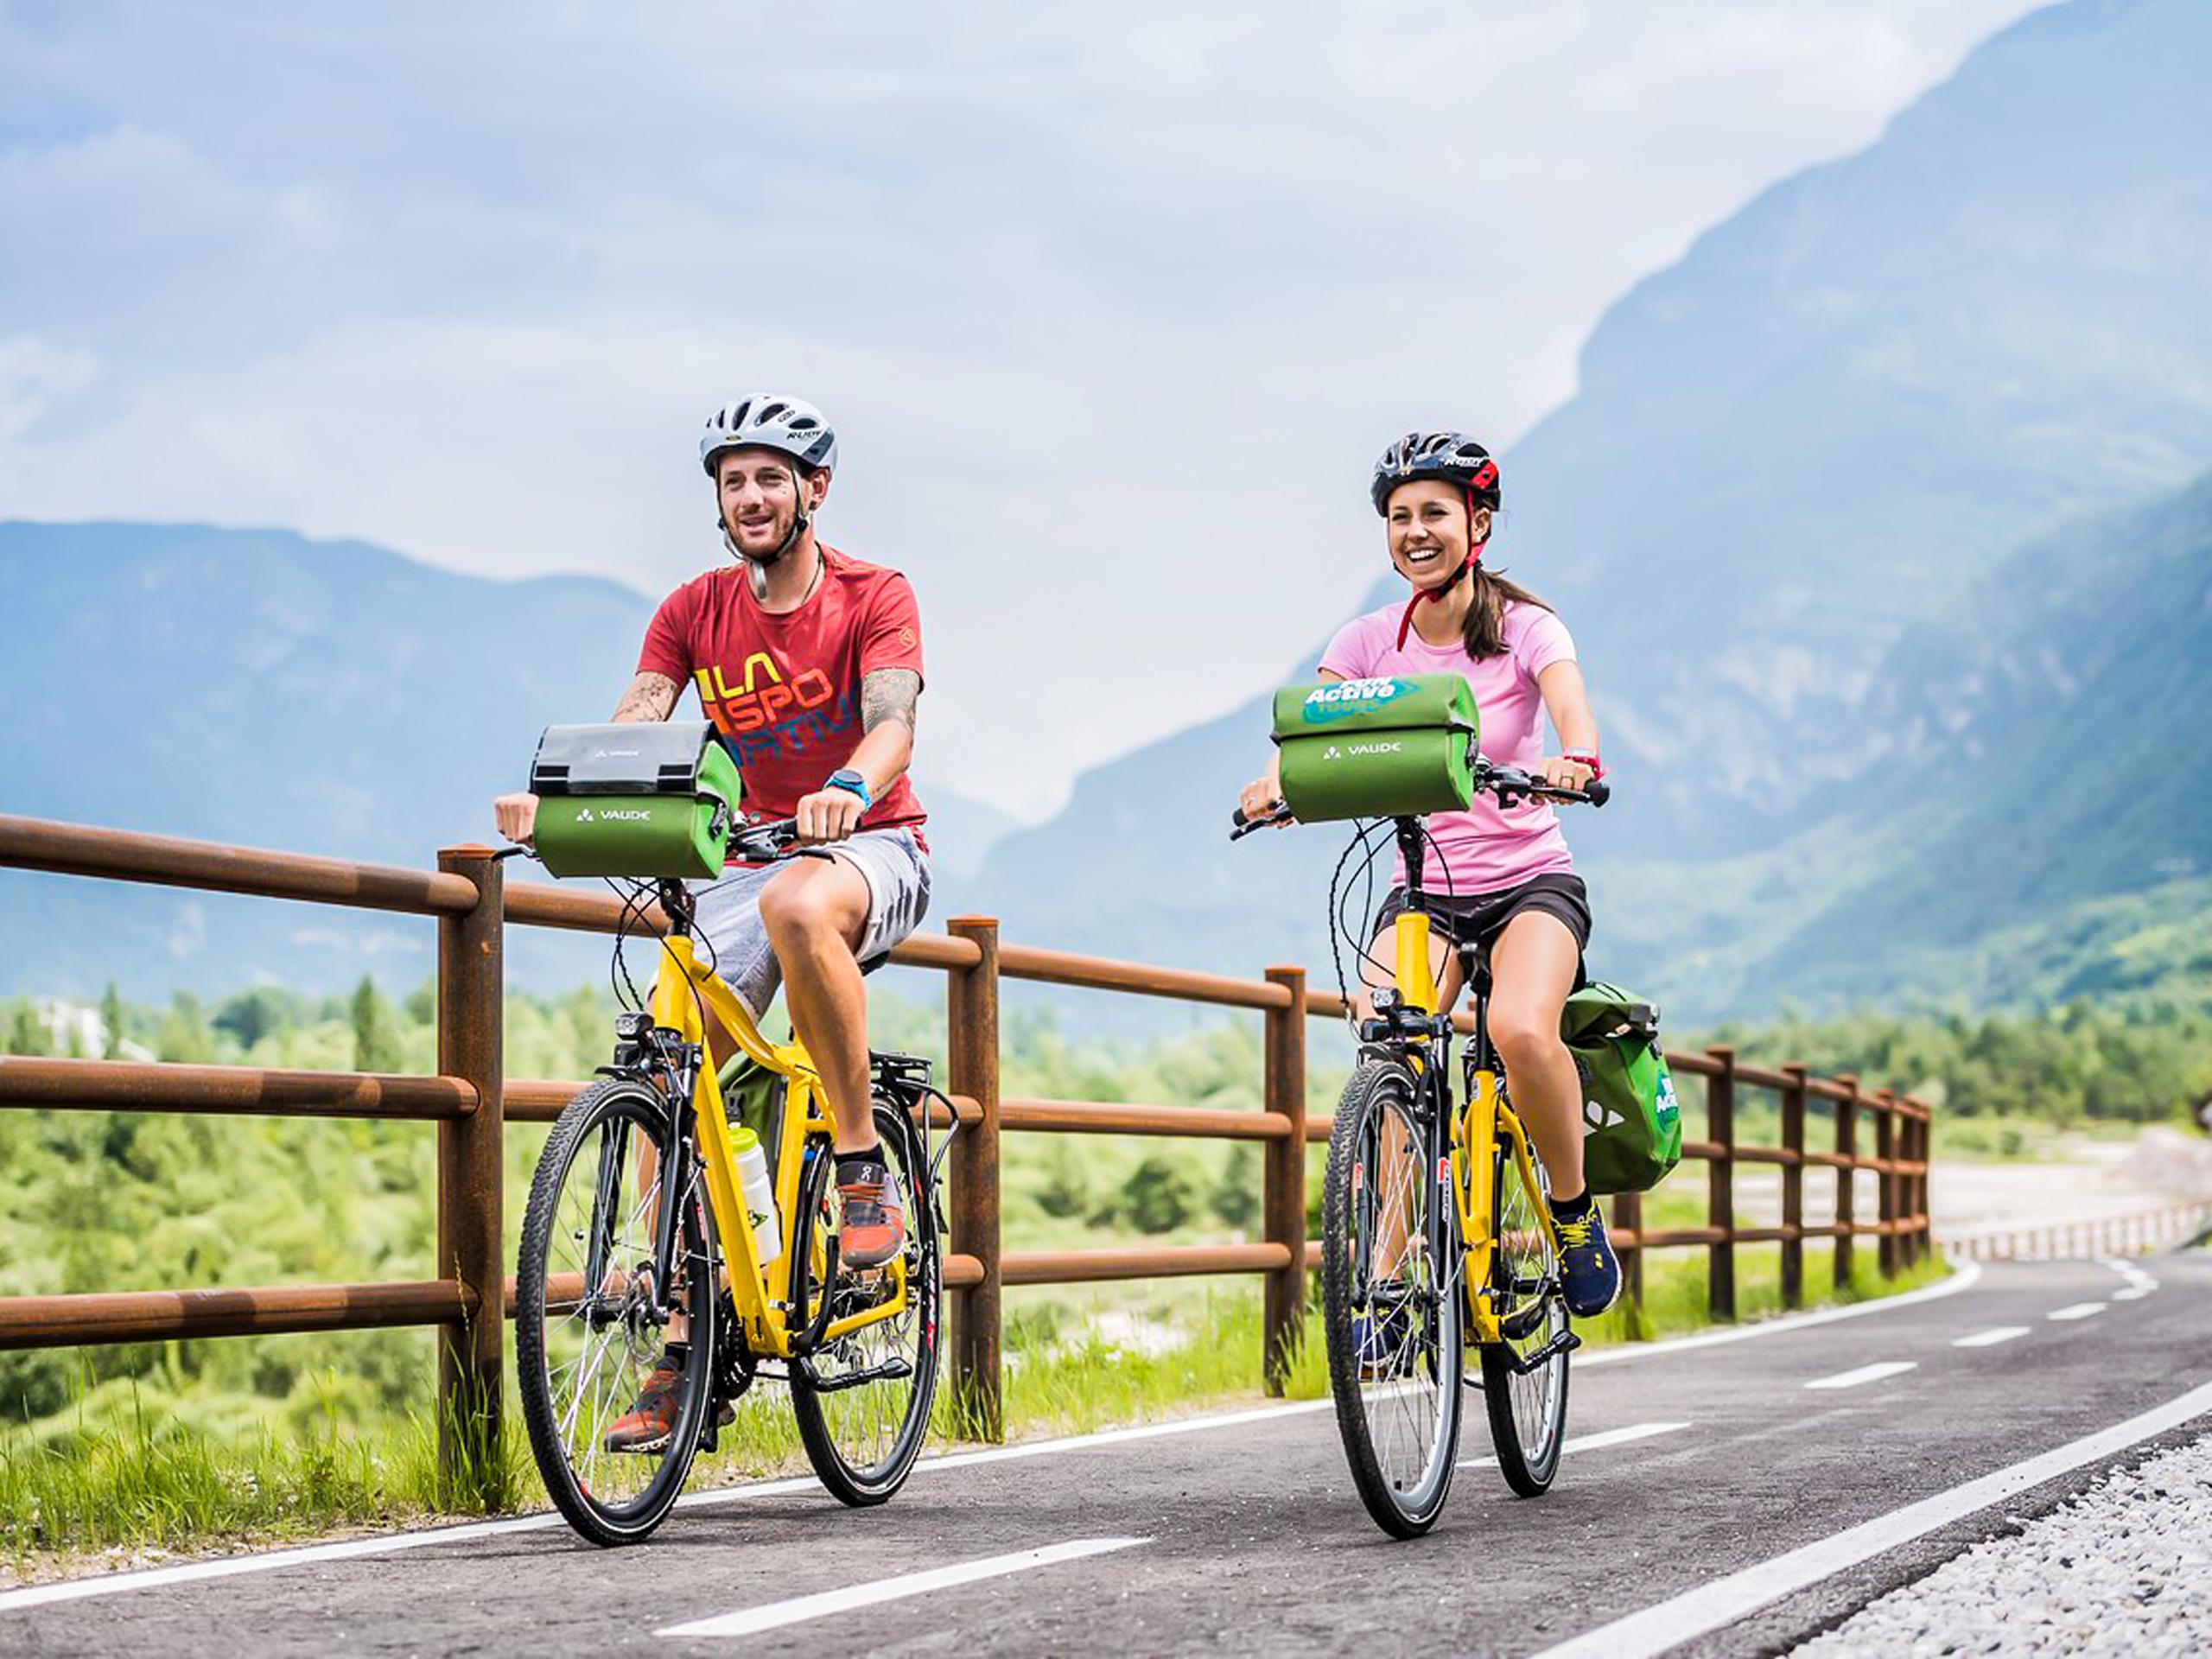 Discovering Dolomiti cycling